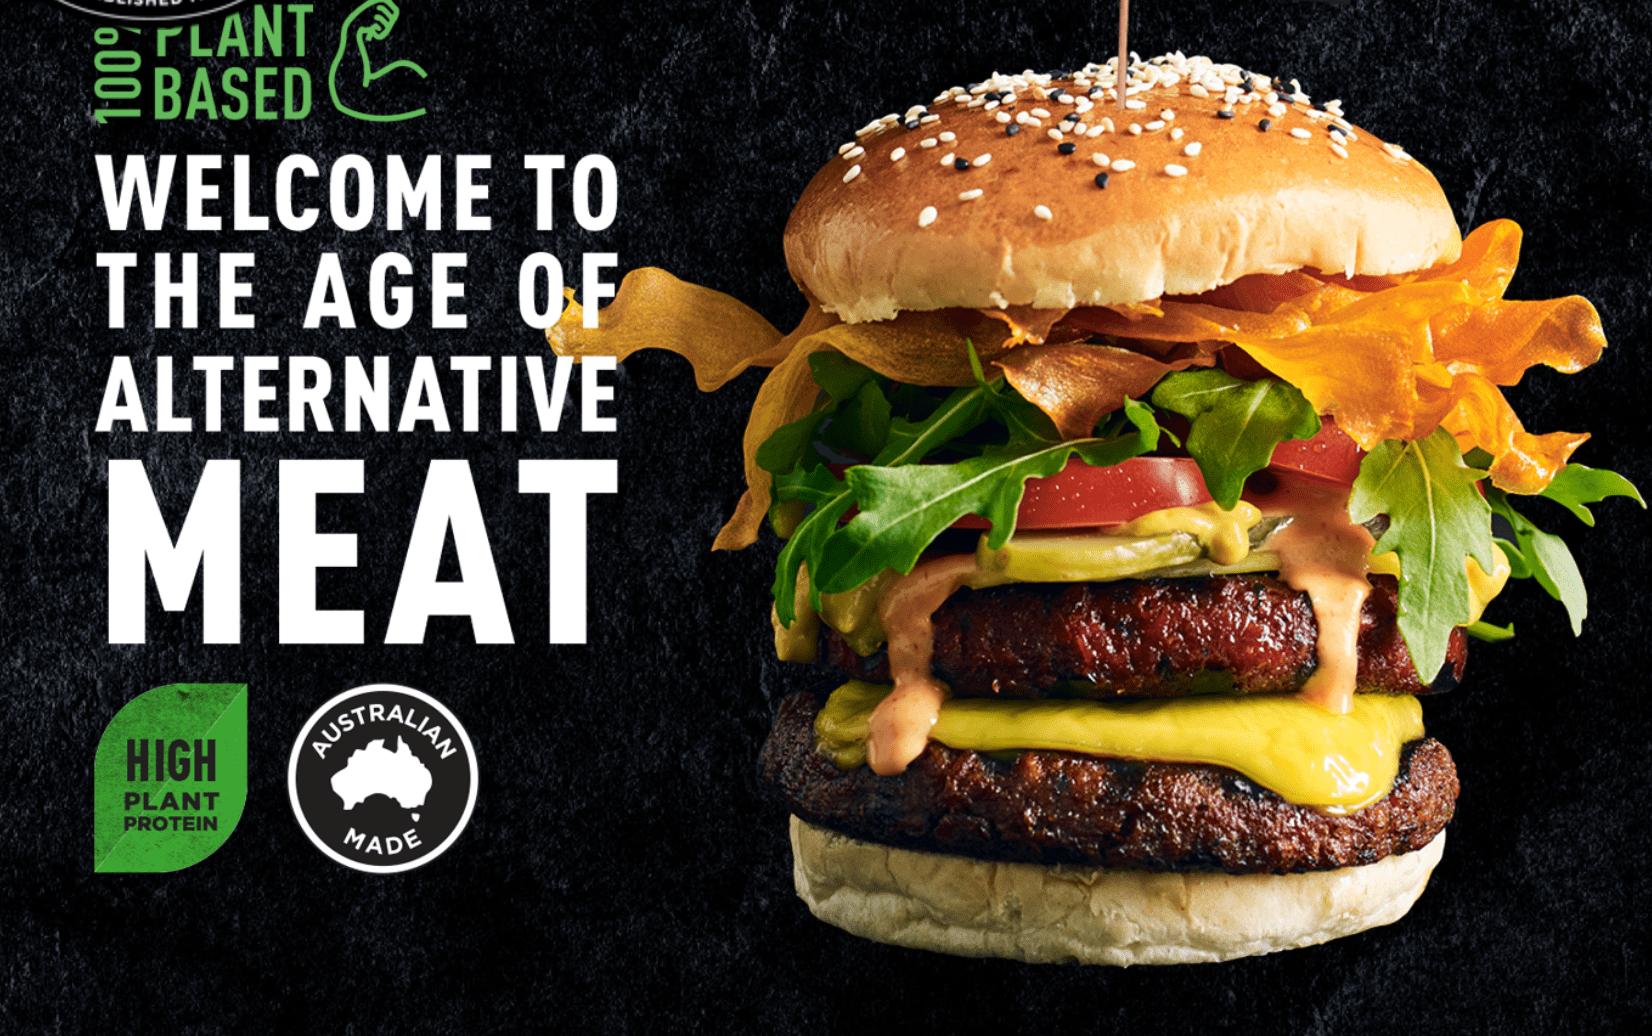 Alternative Meat Co